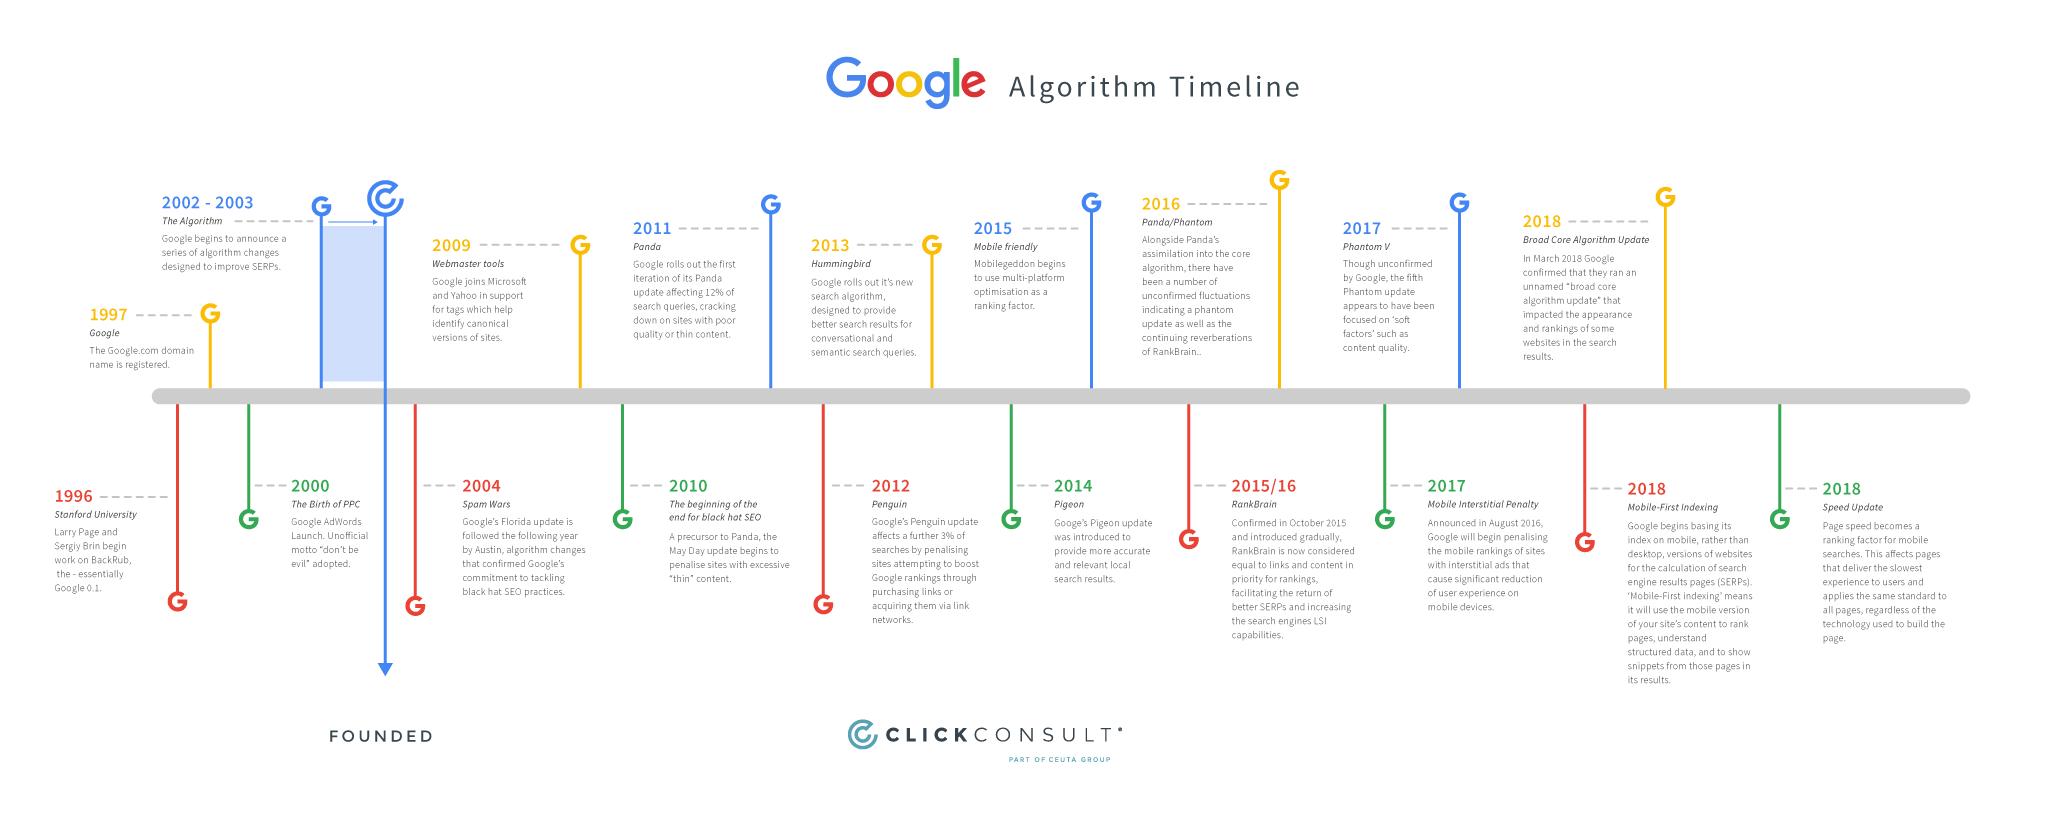 Google Algorithm Timeline From 1996